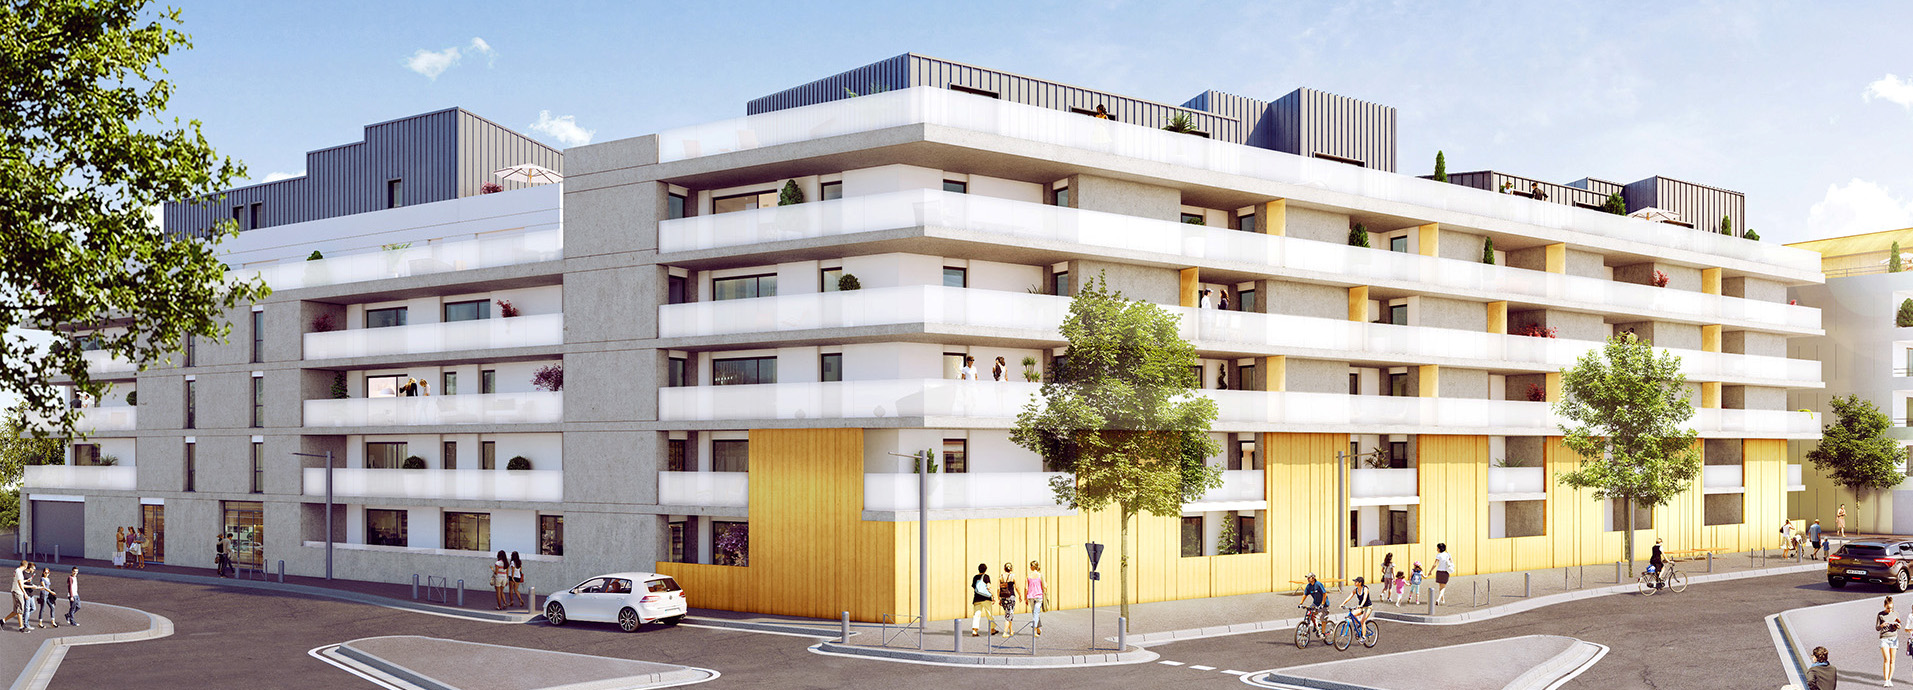 Residence Dedicace Toulouse Nue-Propriete